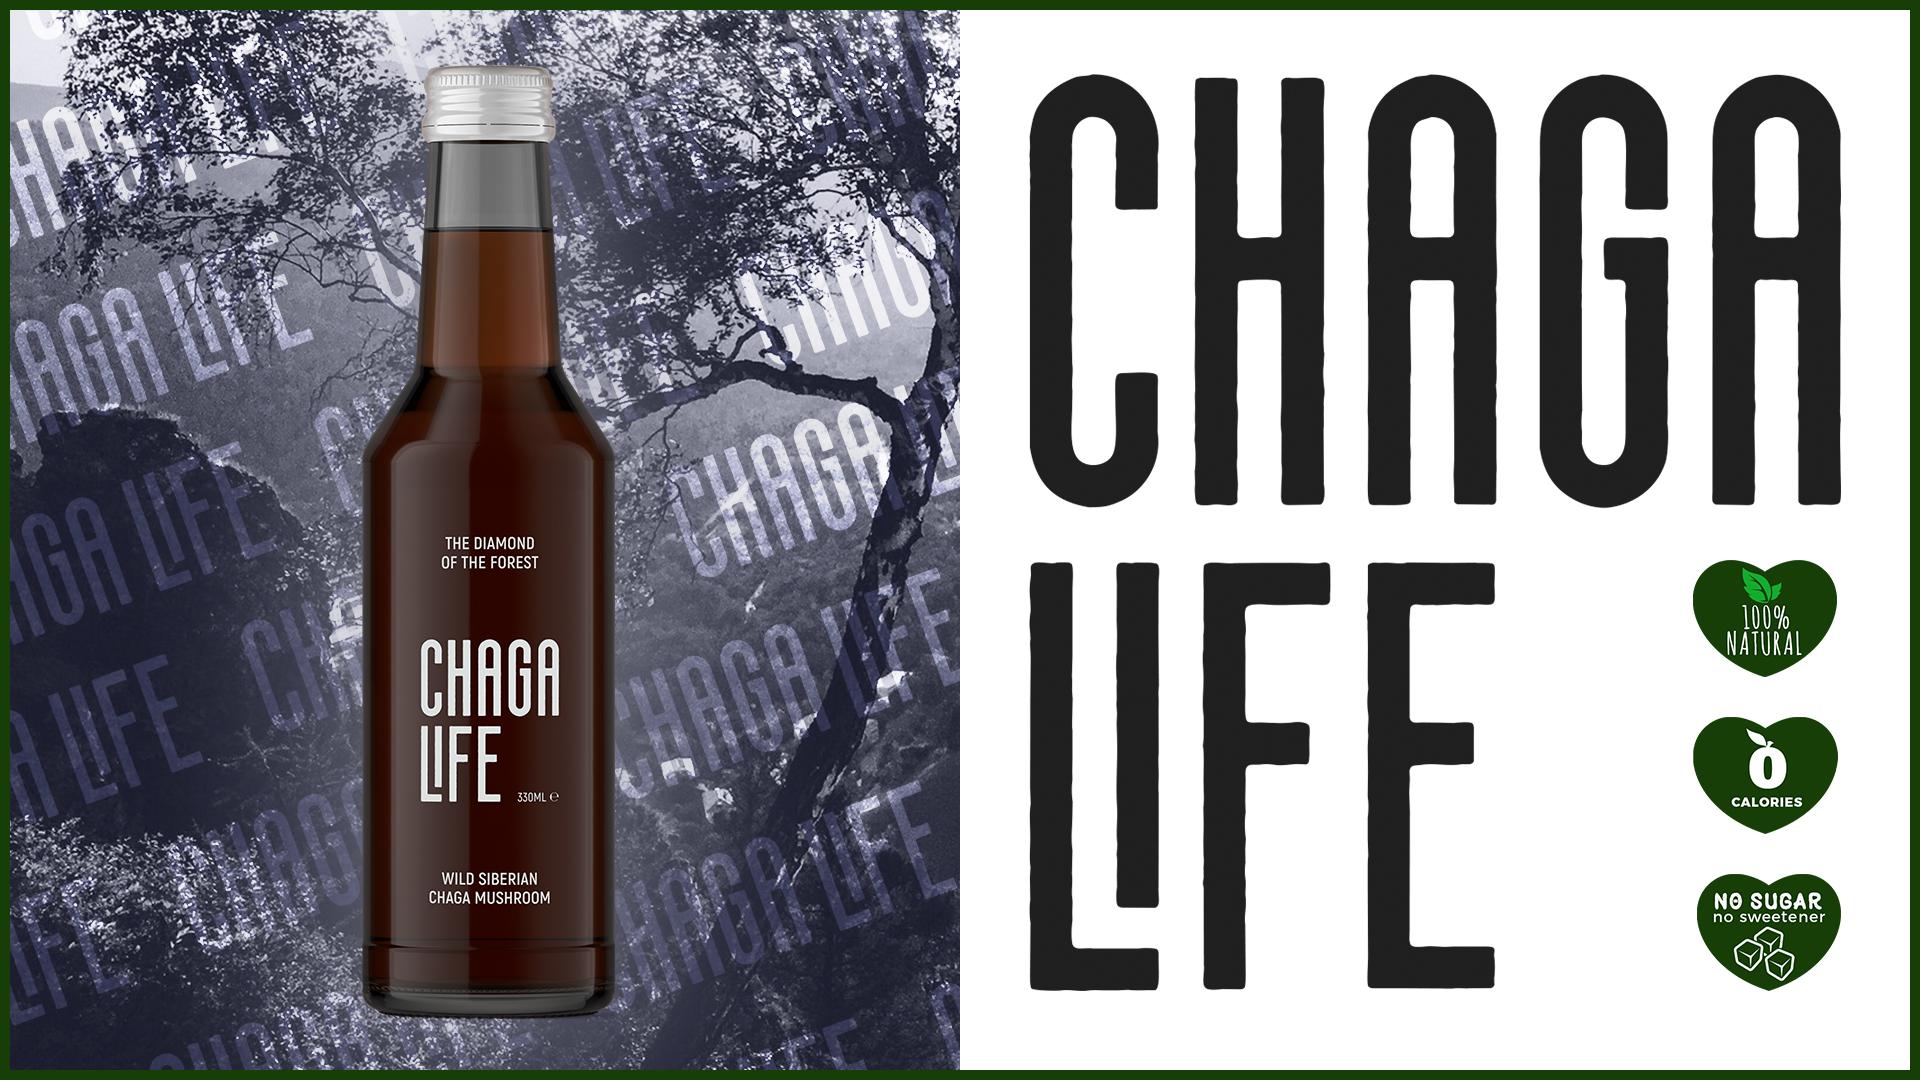 CHAGA LIFE | Product Launch